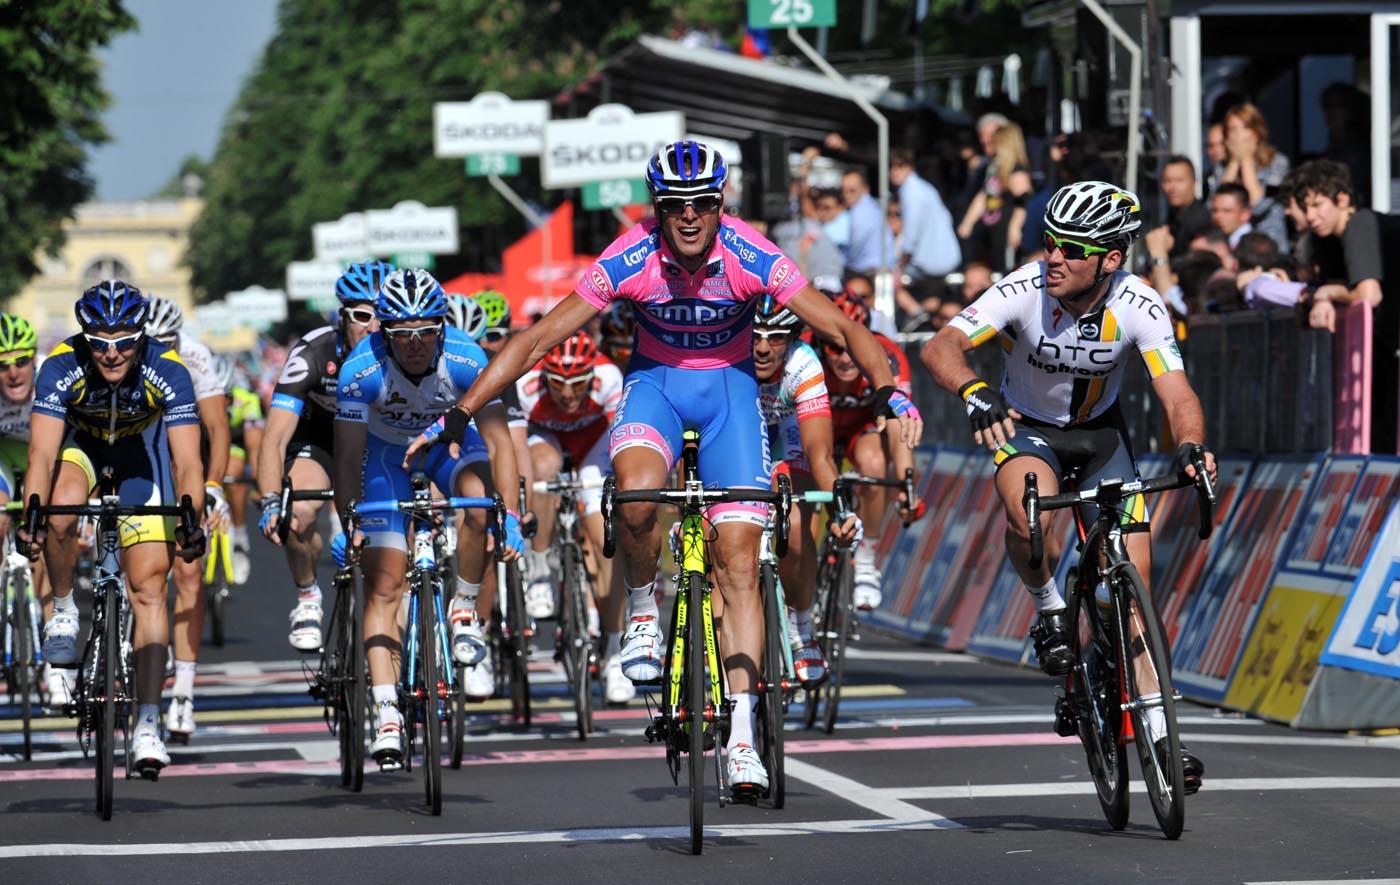 Alessandro Petacchi wins stage, Giro d